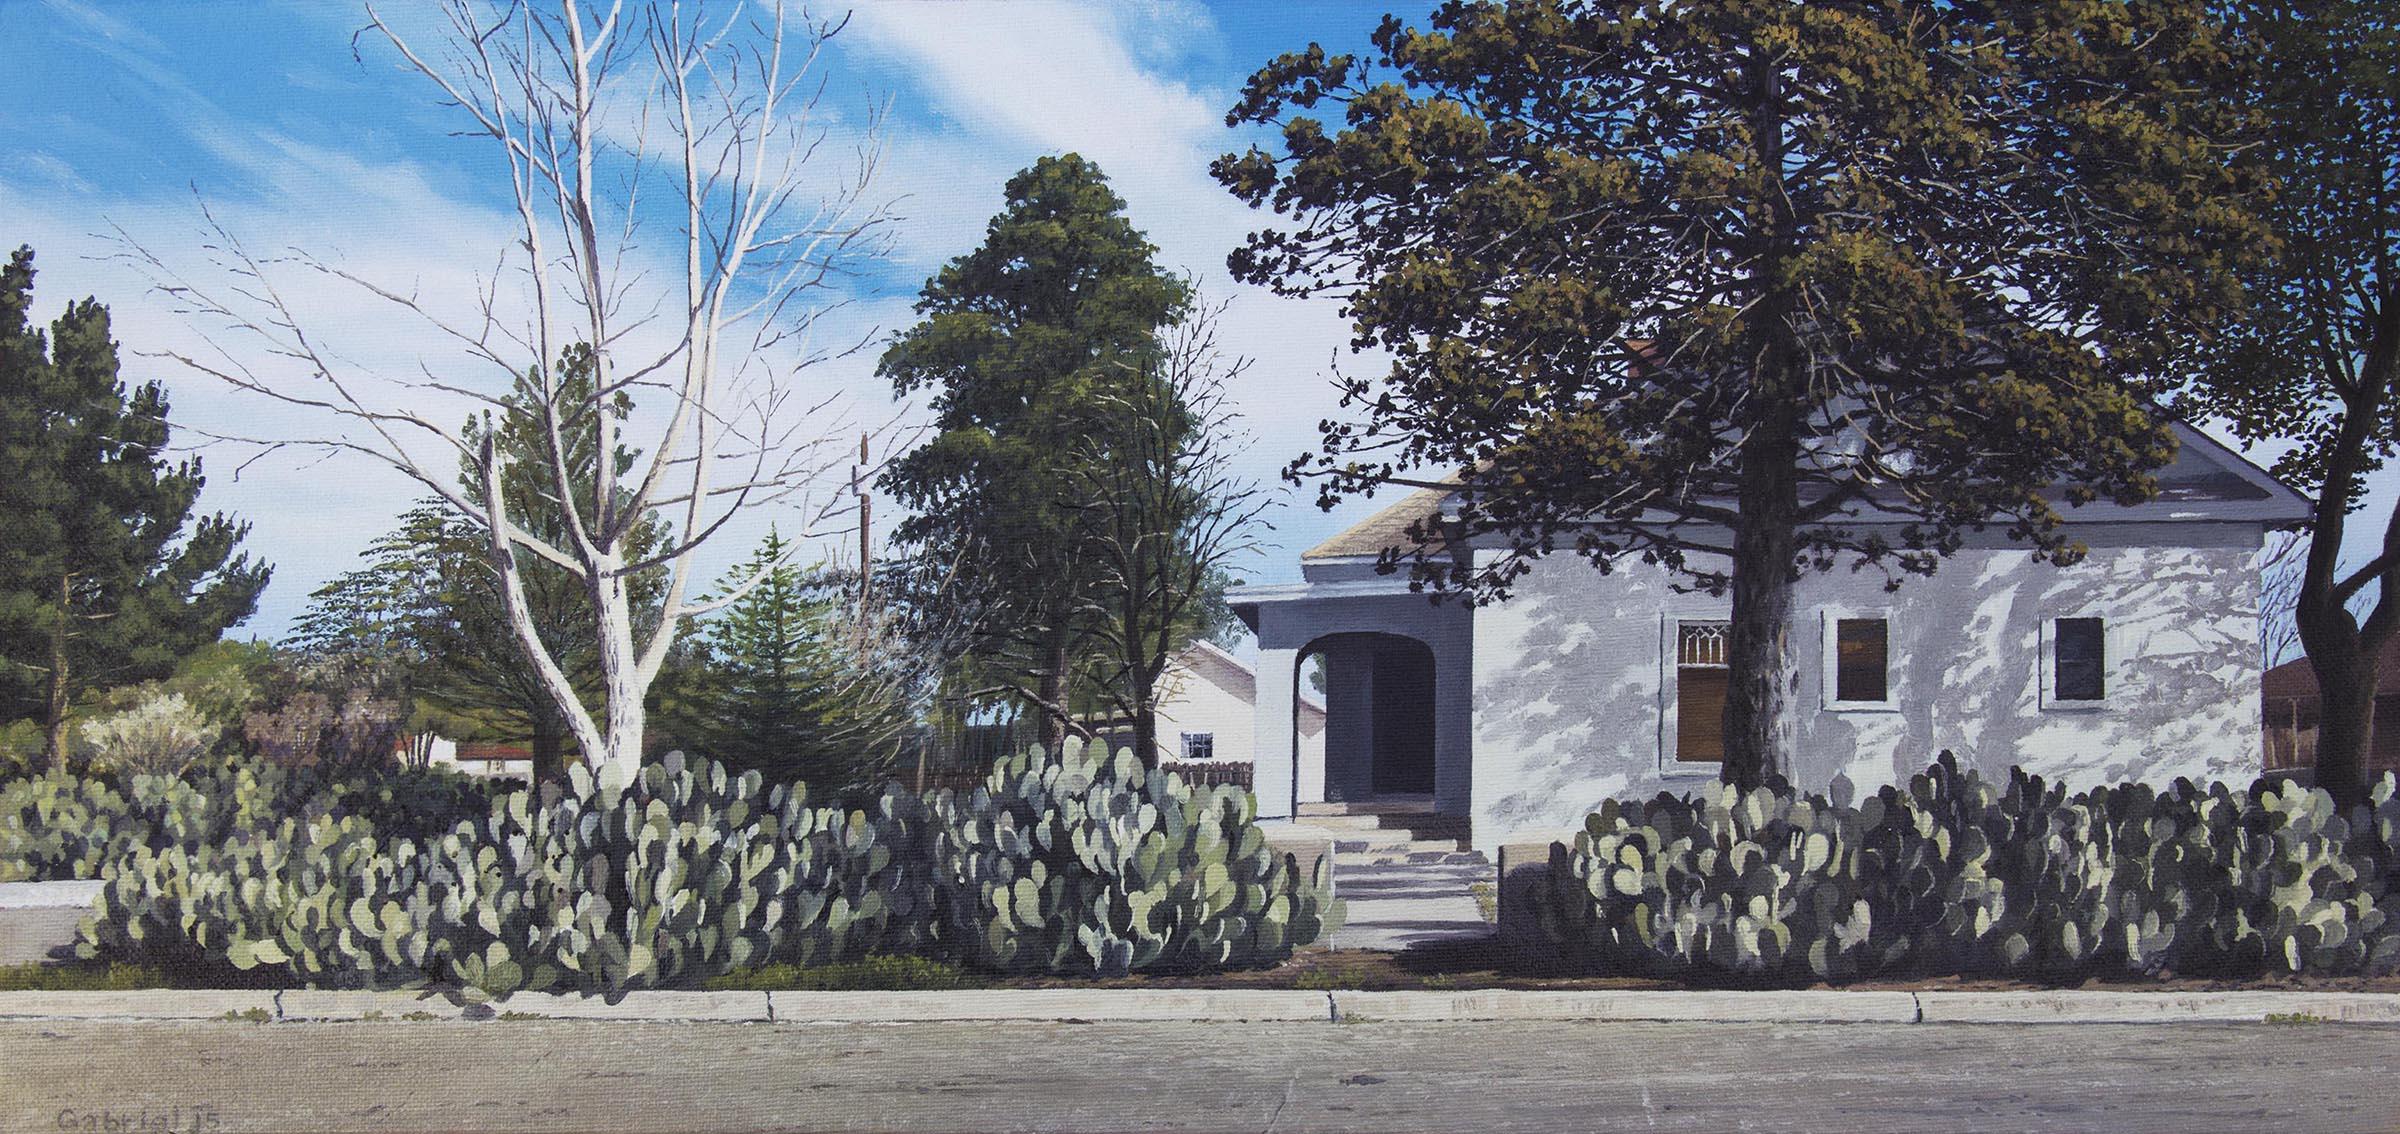 Pat Gabriel, Cactus Heaven, 2015